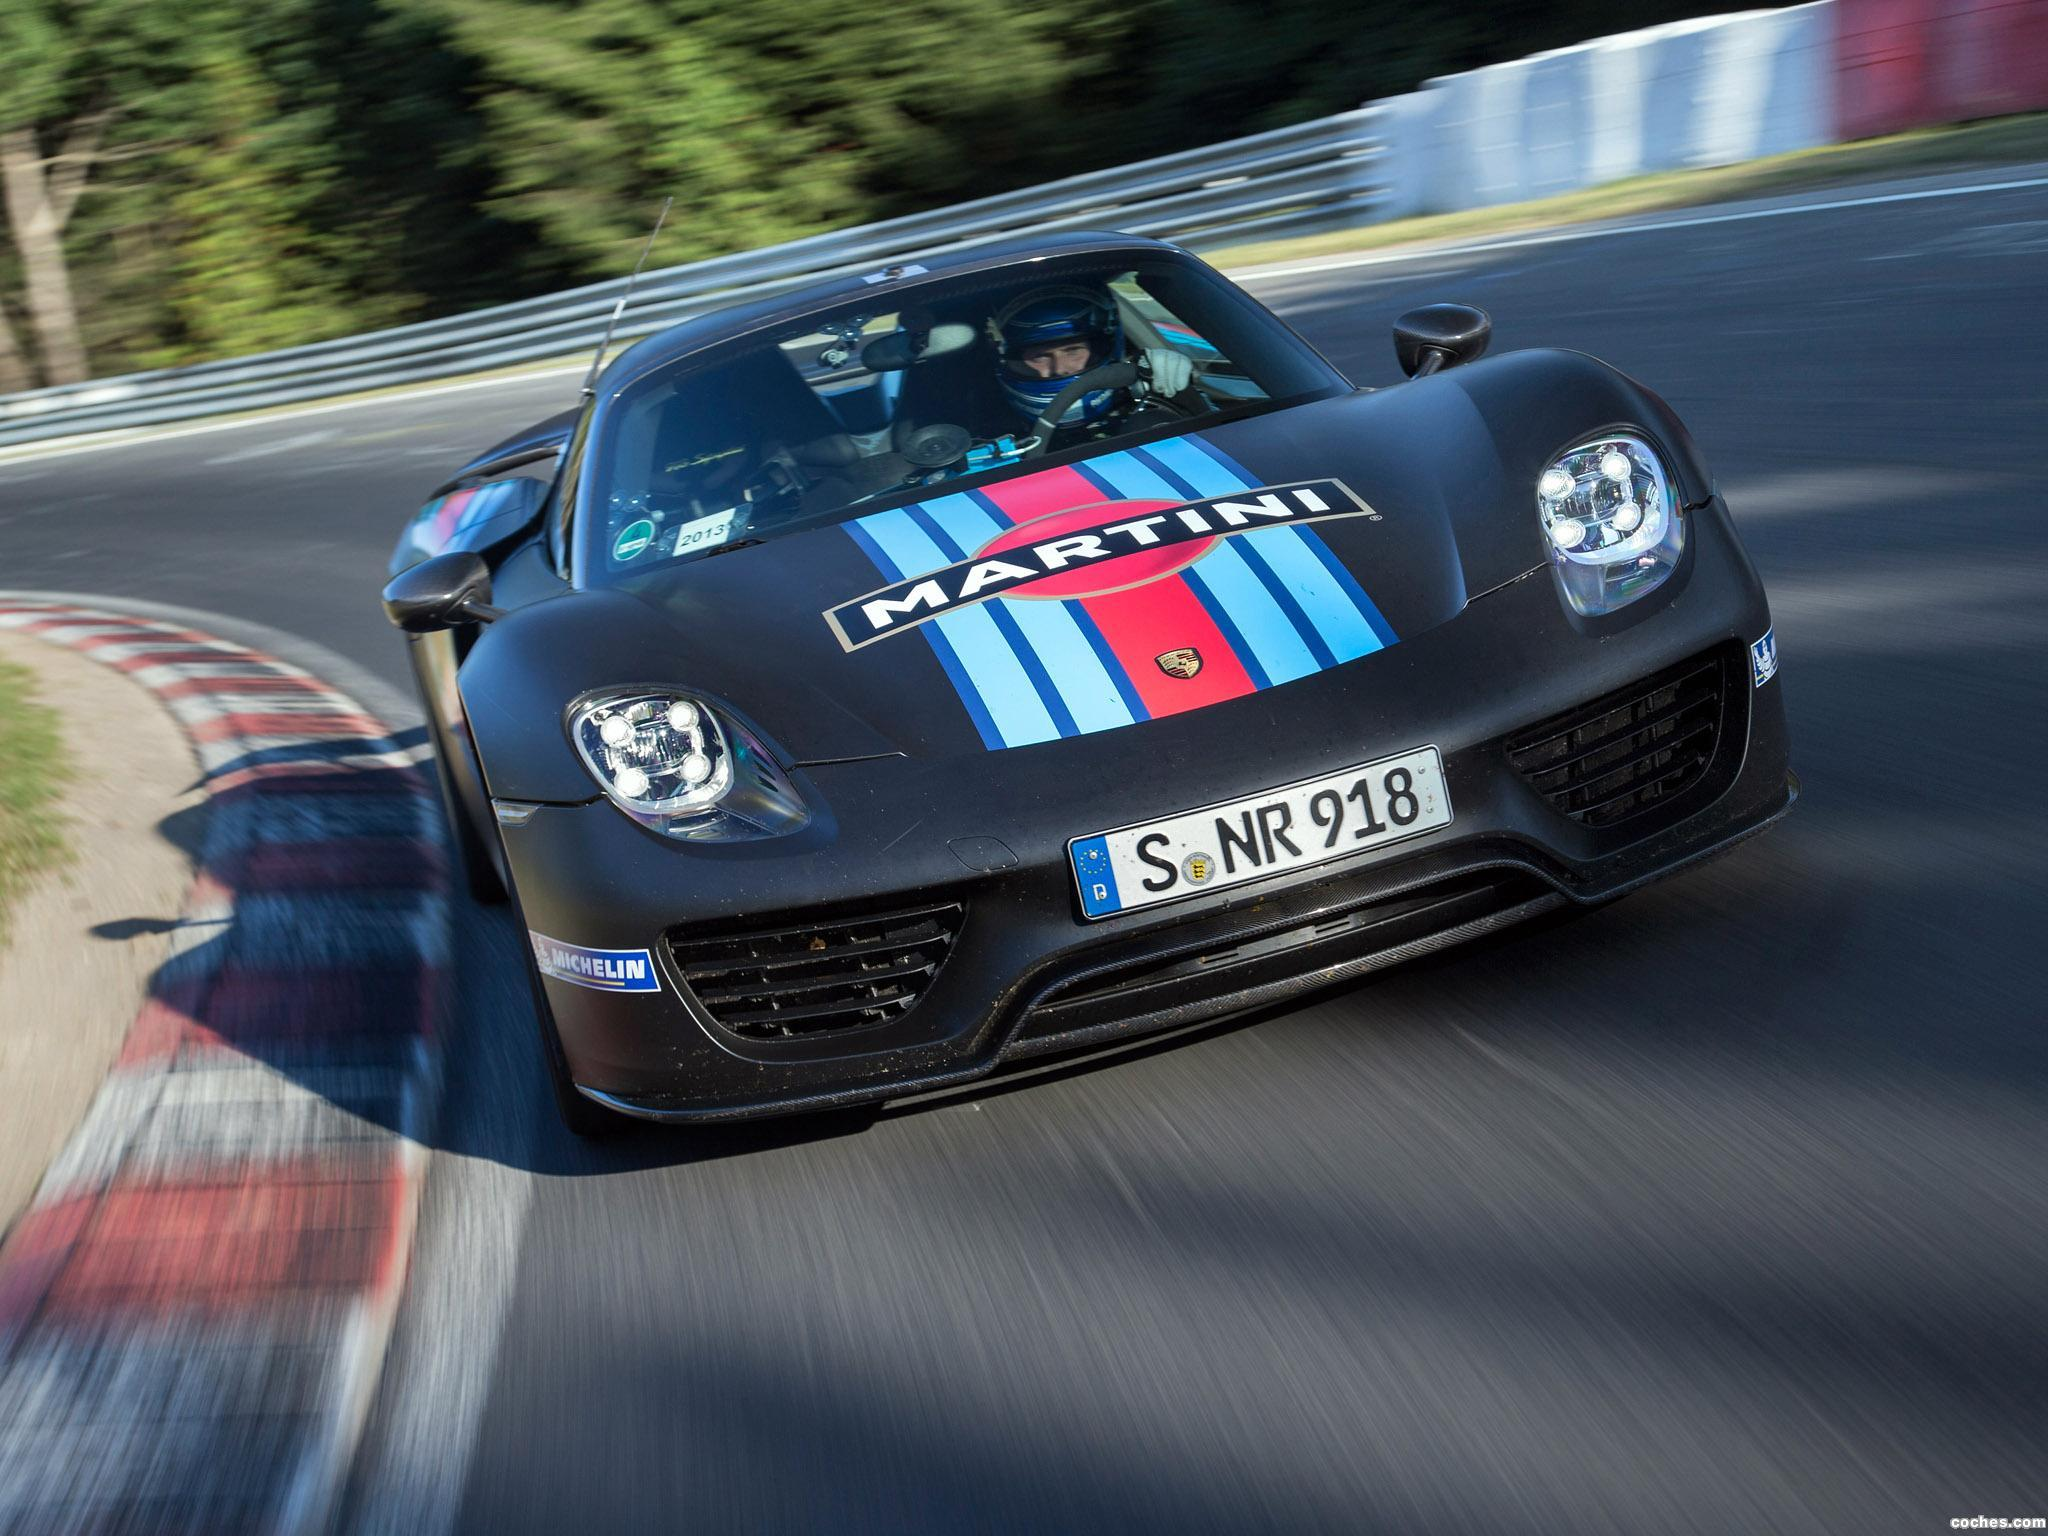 porsche_918-spyder-martini-racing-2014_r4